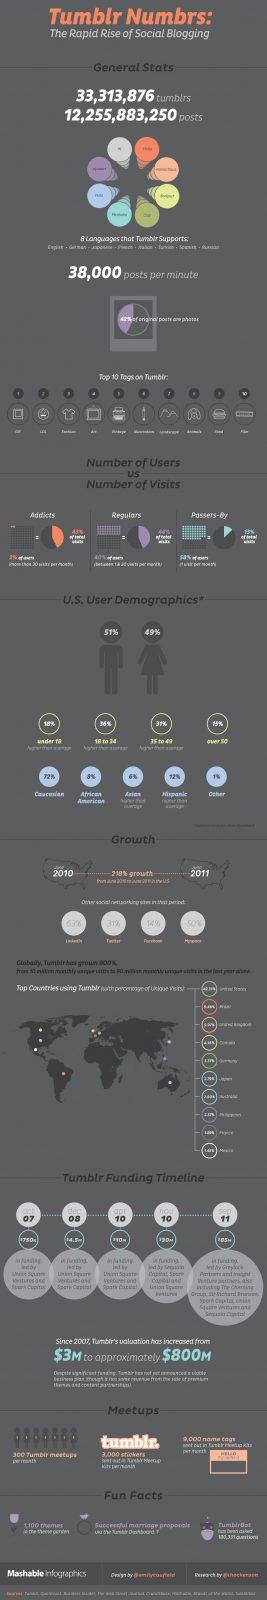 Social Media Networks In 2012 Infographics 4